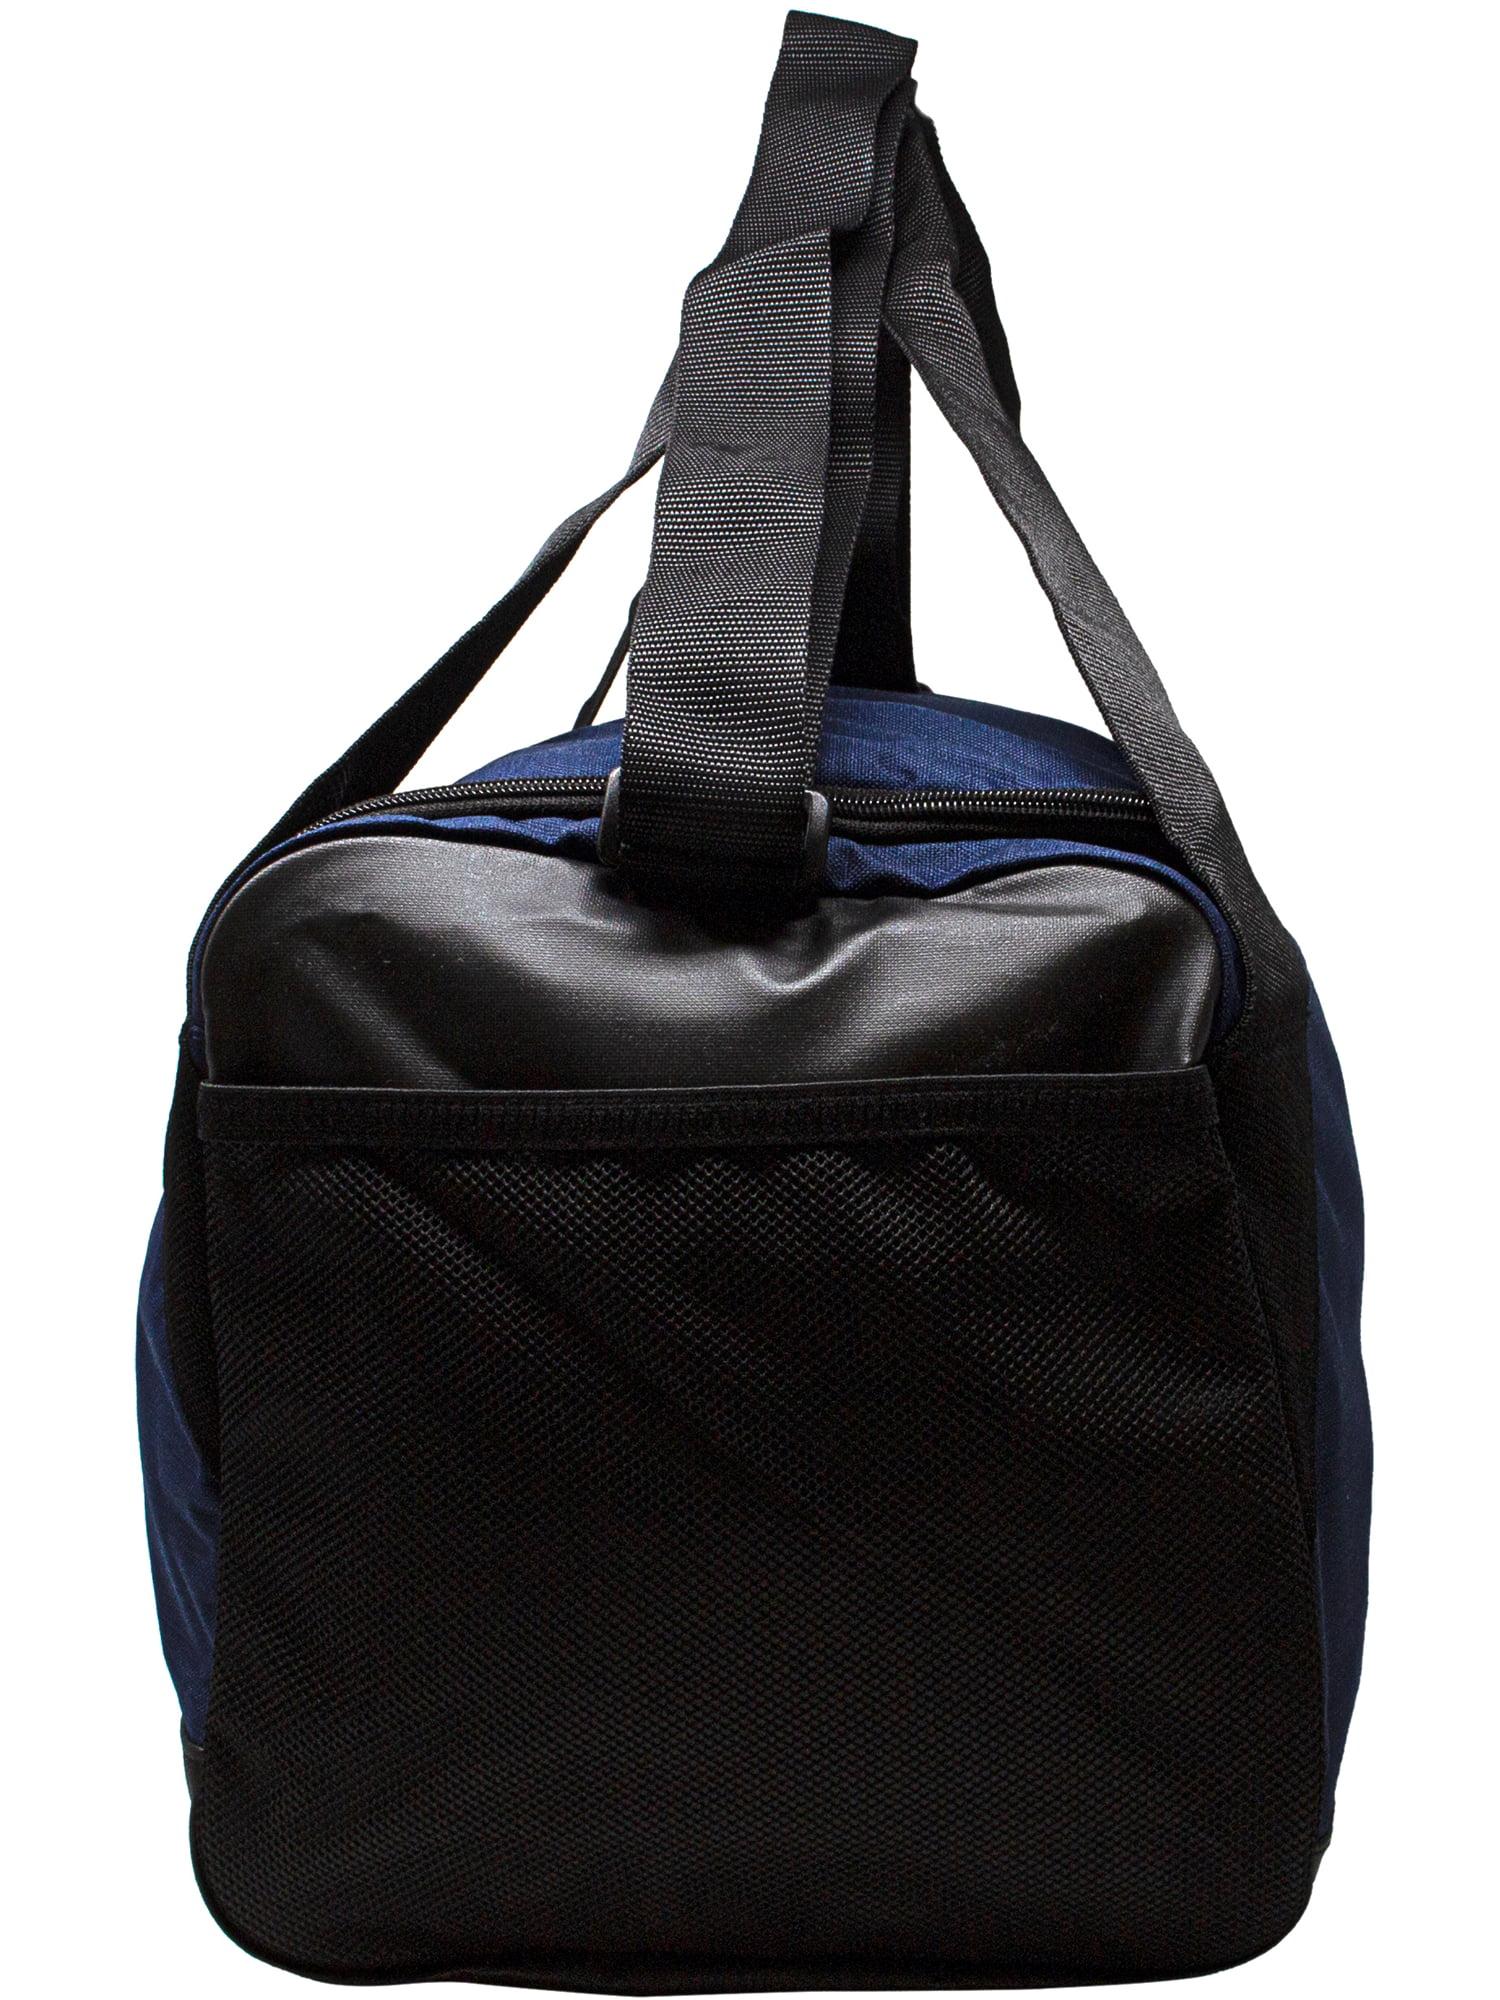 9859f5f34b2d Nike - Nike Brasilia Small Duffel Polyester Duffle Bag Hobo - Midnight Navy    Black White - Walmart.com